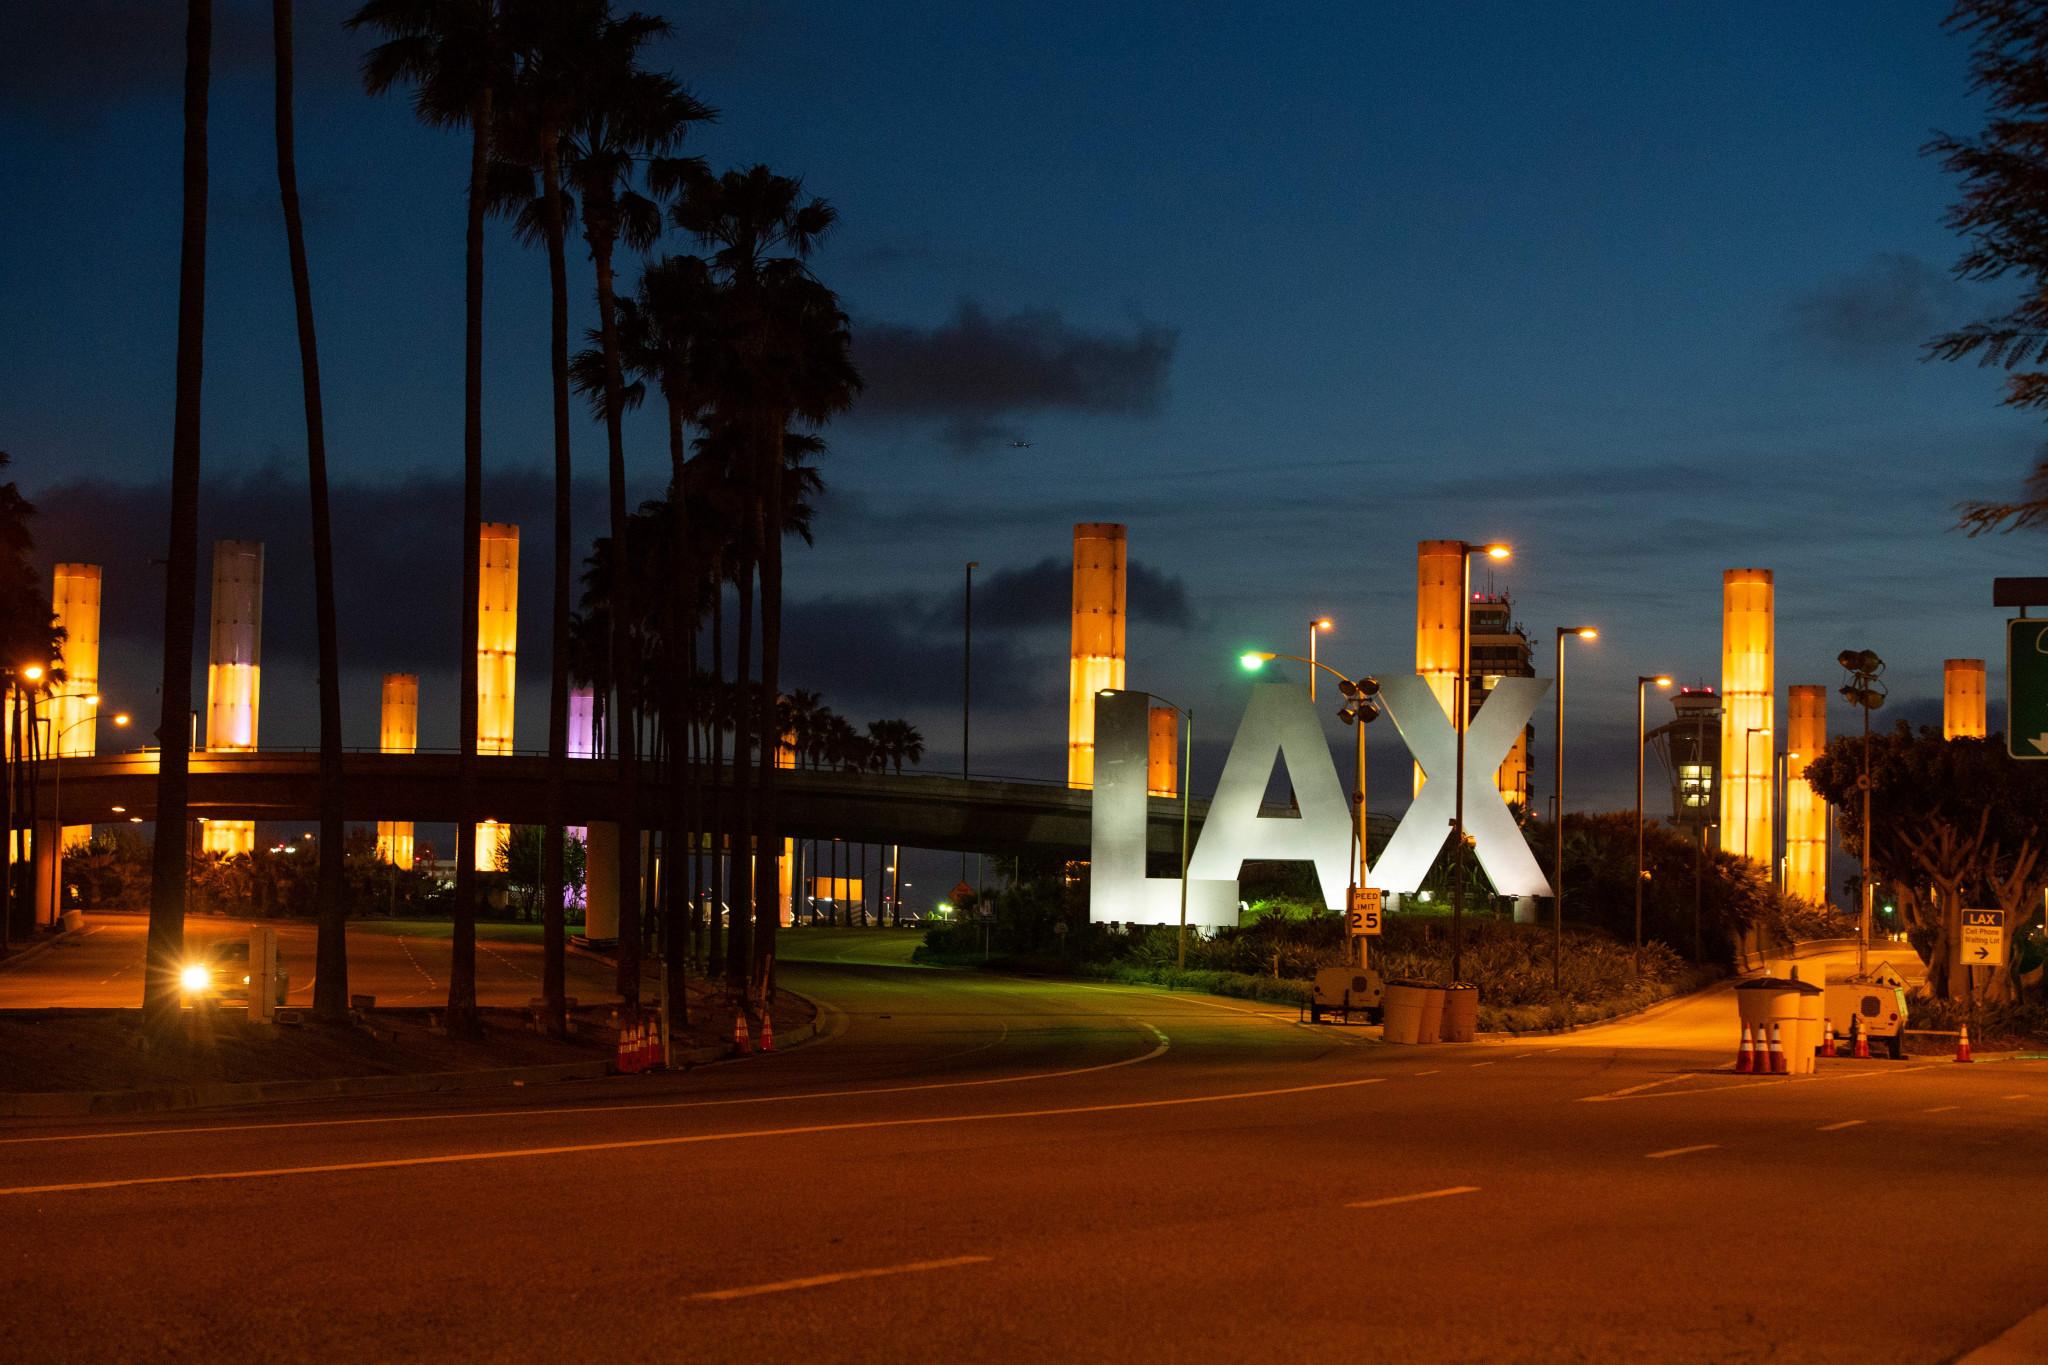 LAX revamp ahead of schedule, Los Angeles 2028 sponsor Delta Air Lines boasts